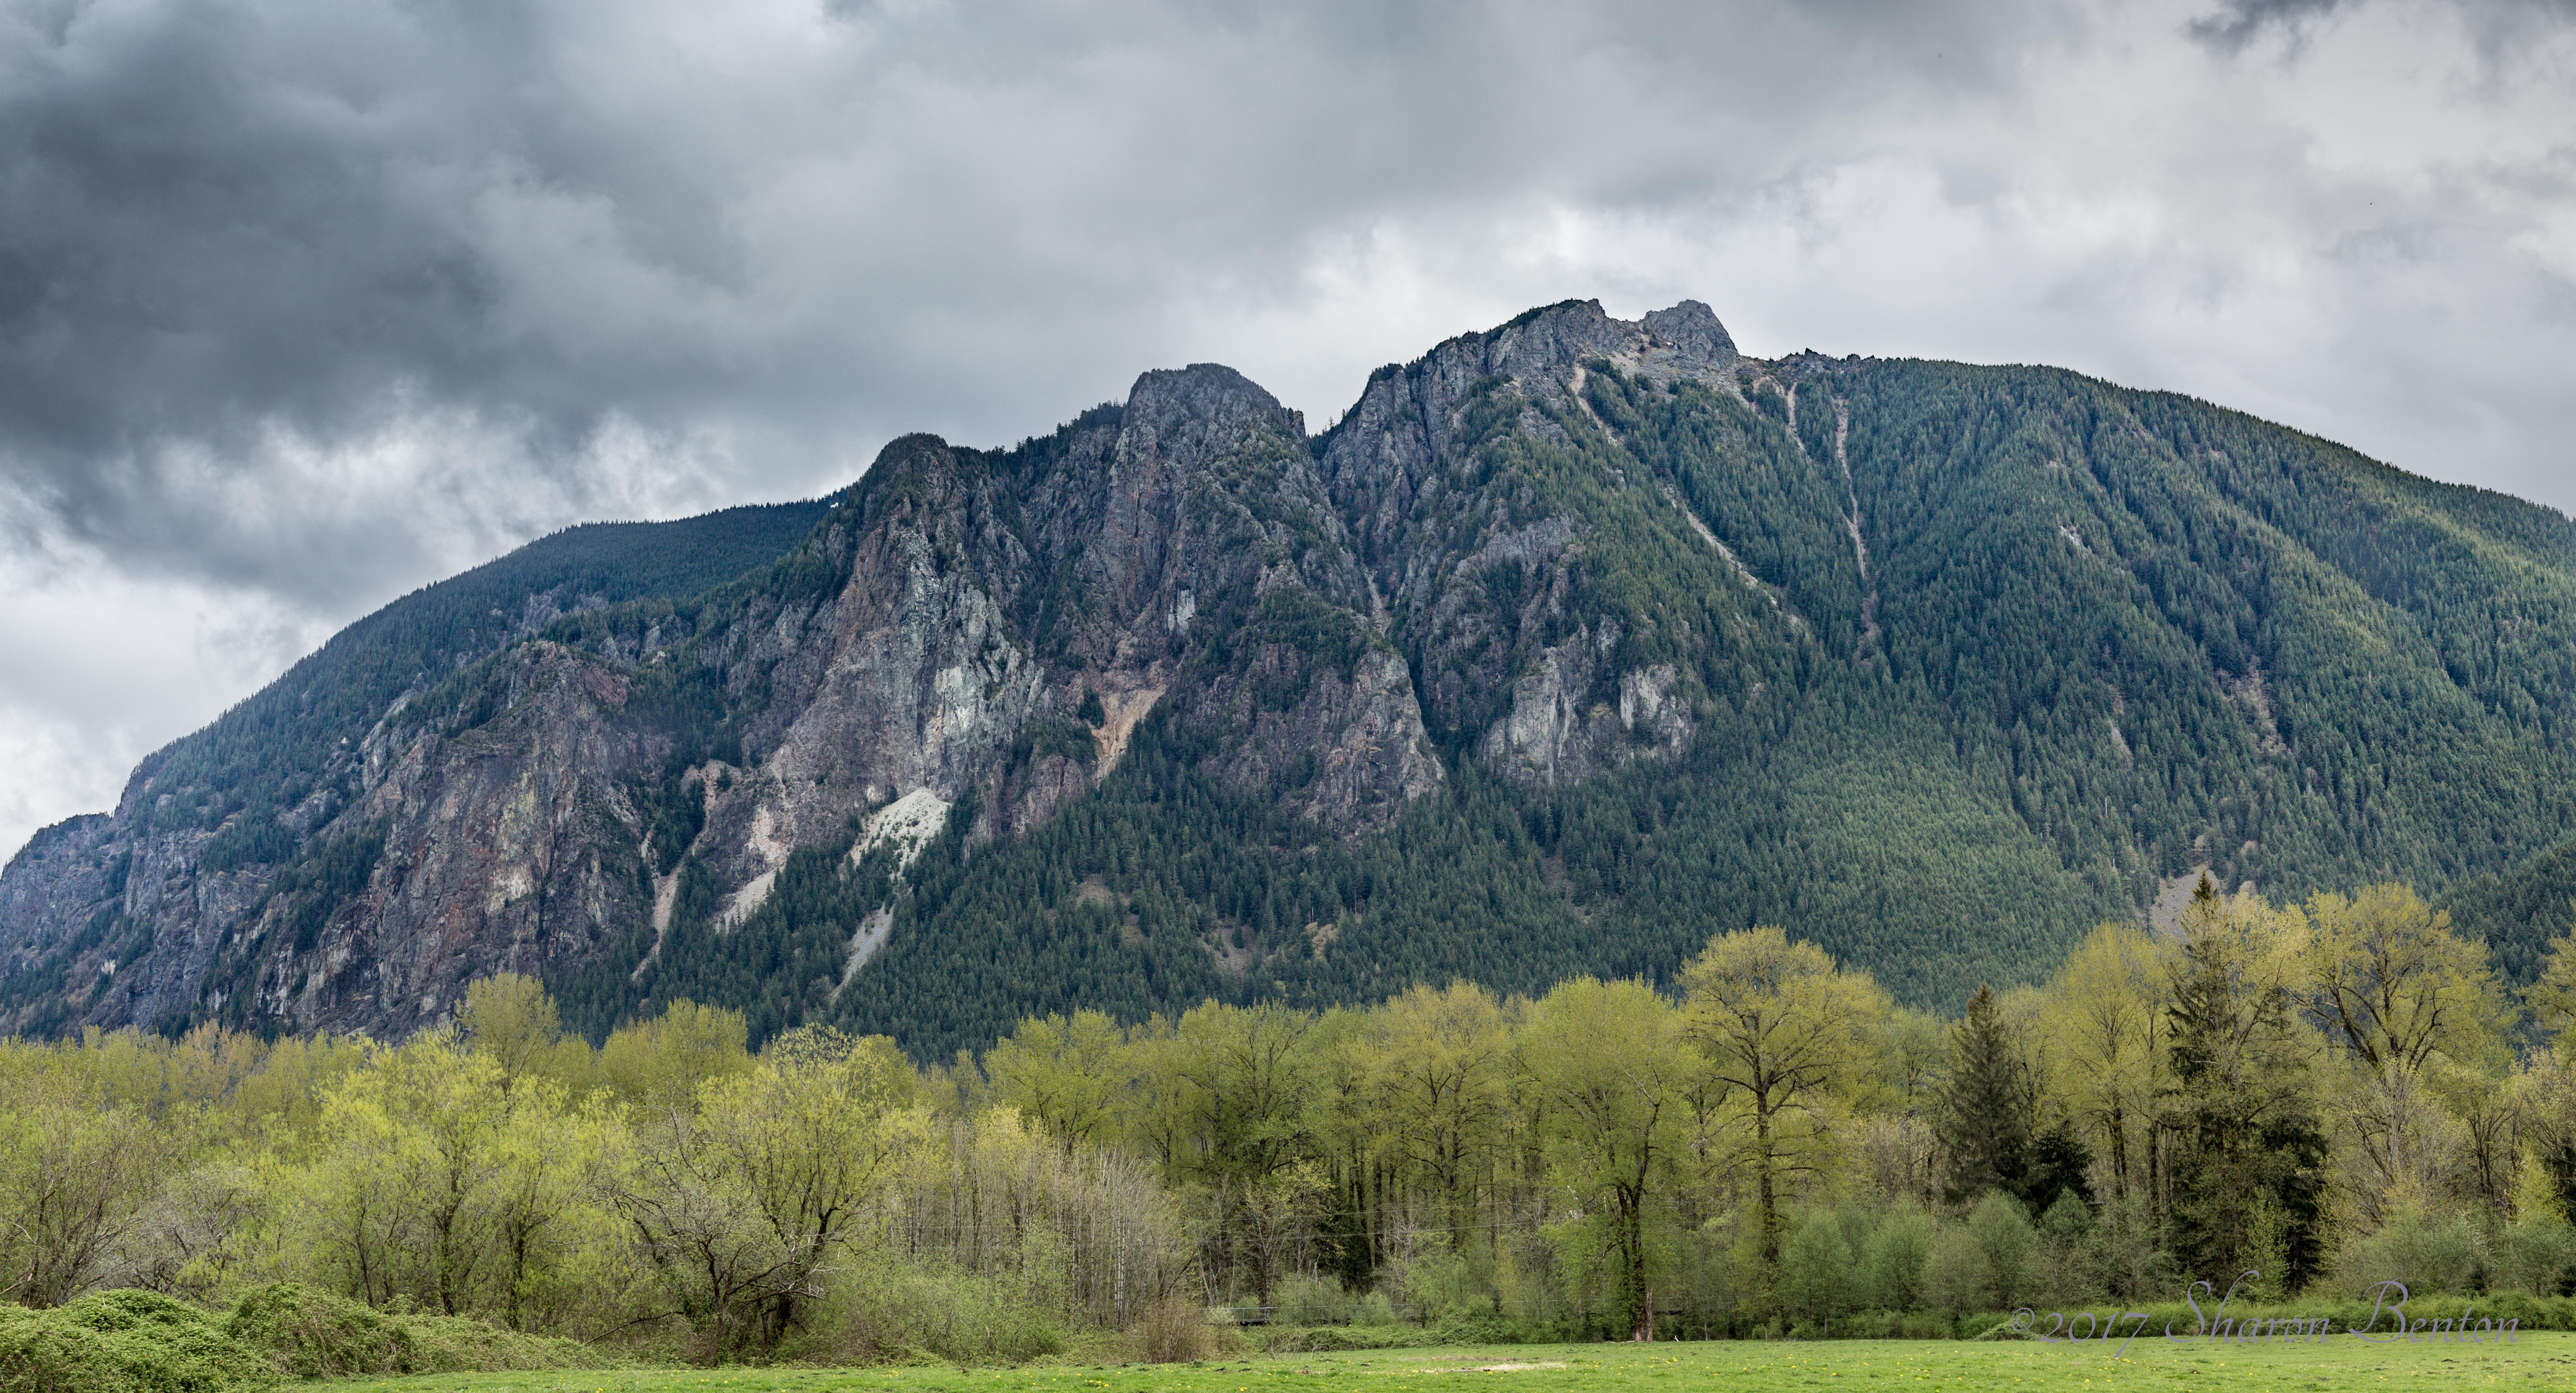 Mount Si, Snoqualmie, WA